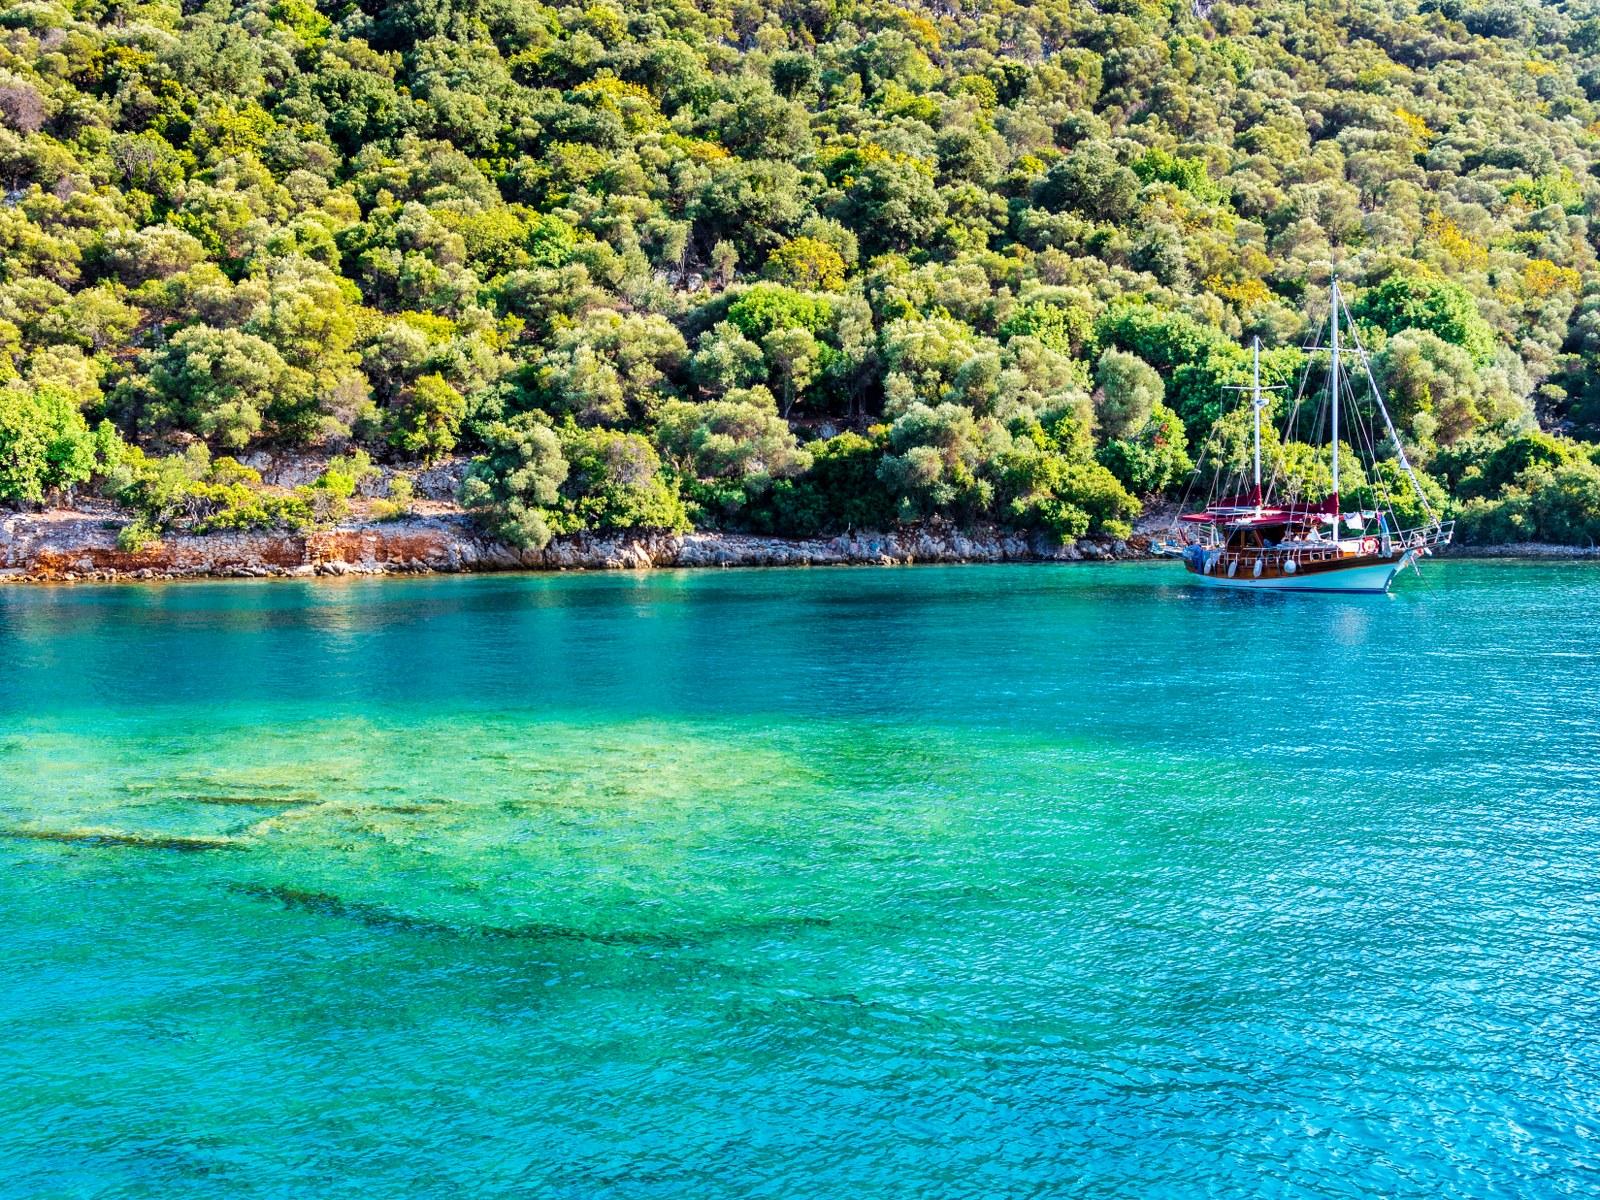 Gocek – Kekova – Gocek Private Cruise Route